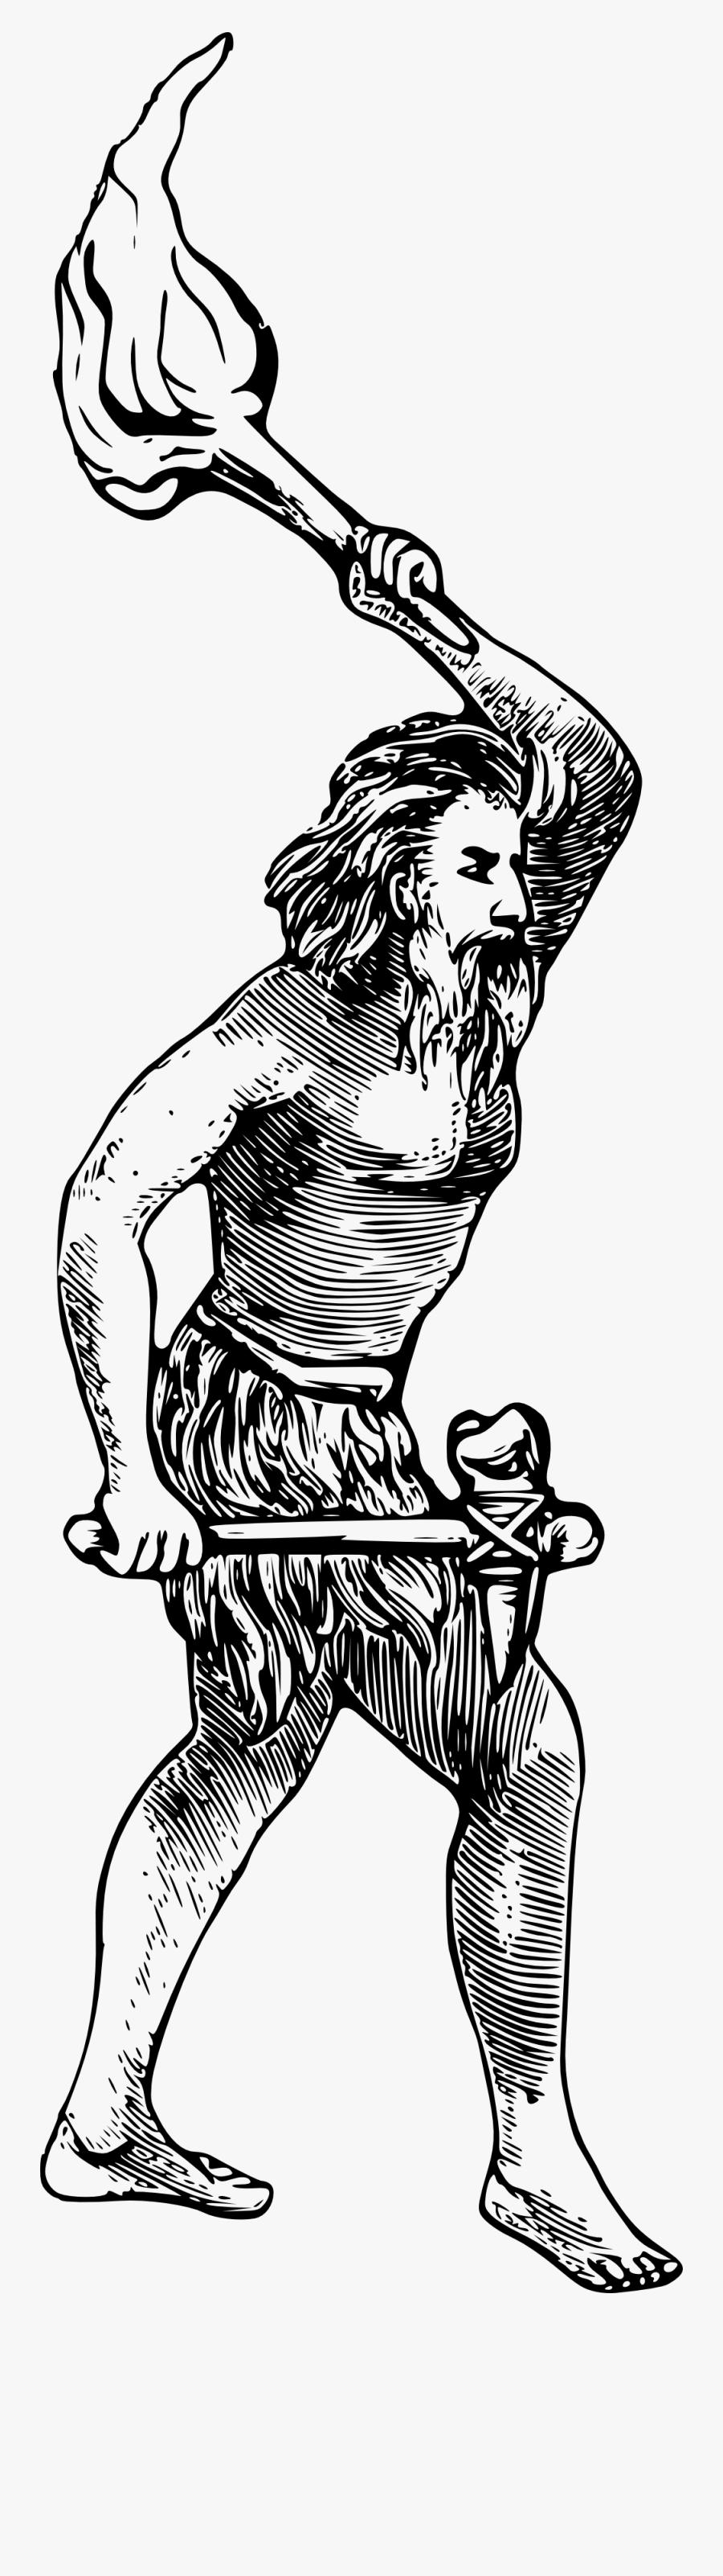 Hunter Gatherer Png , Free Transparent Clipart.